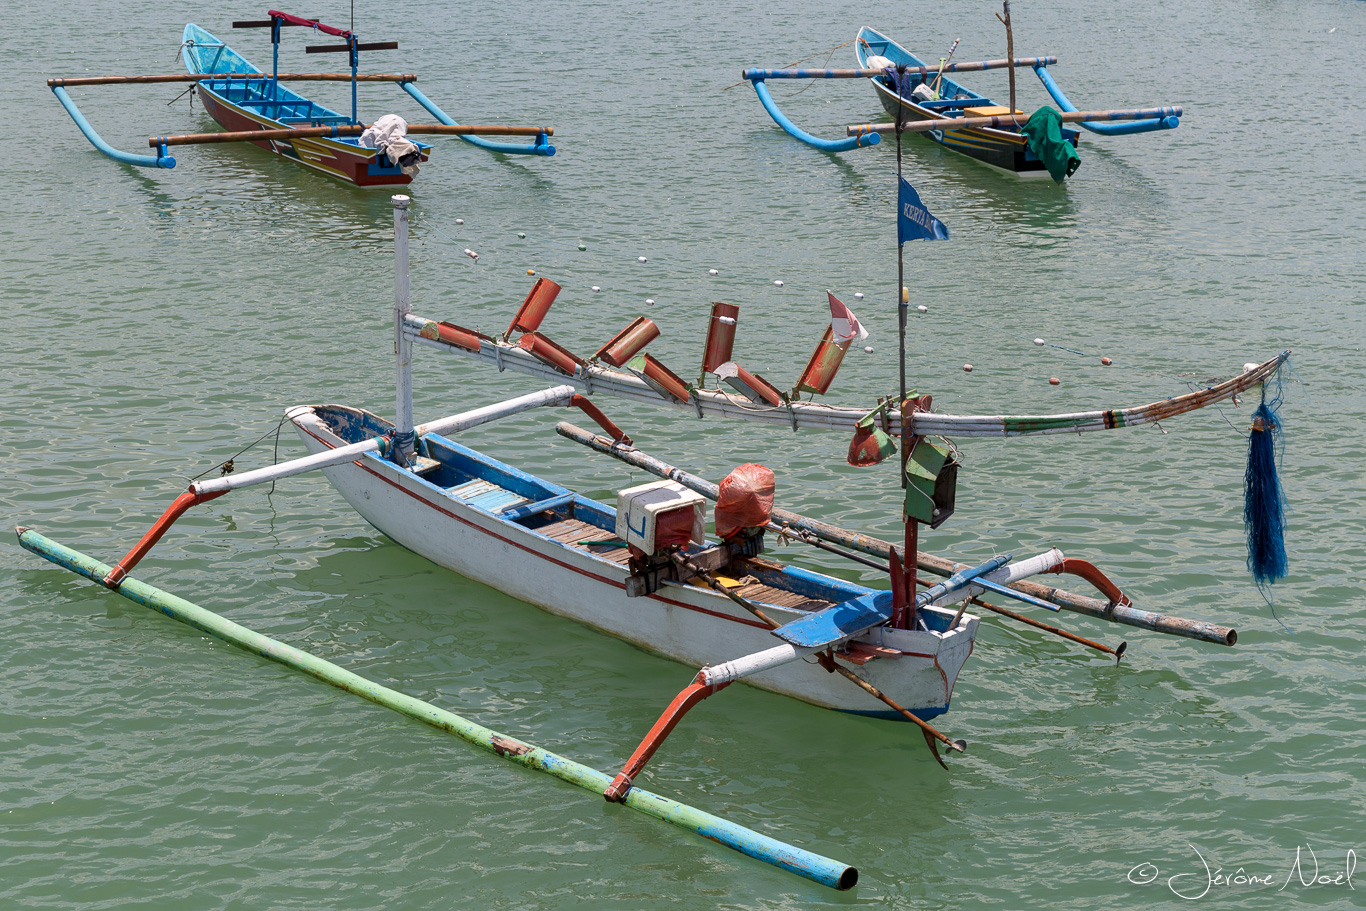 Plage de Jimbaran - Bateaux de pêche